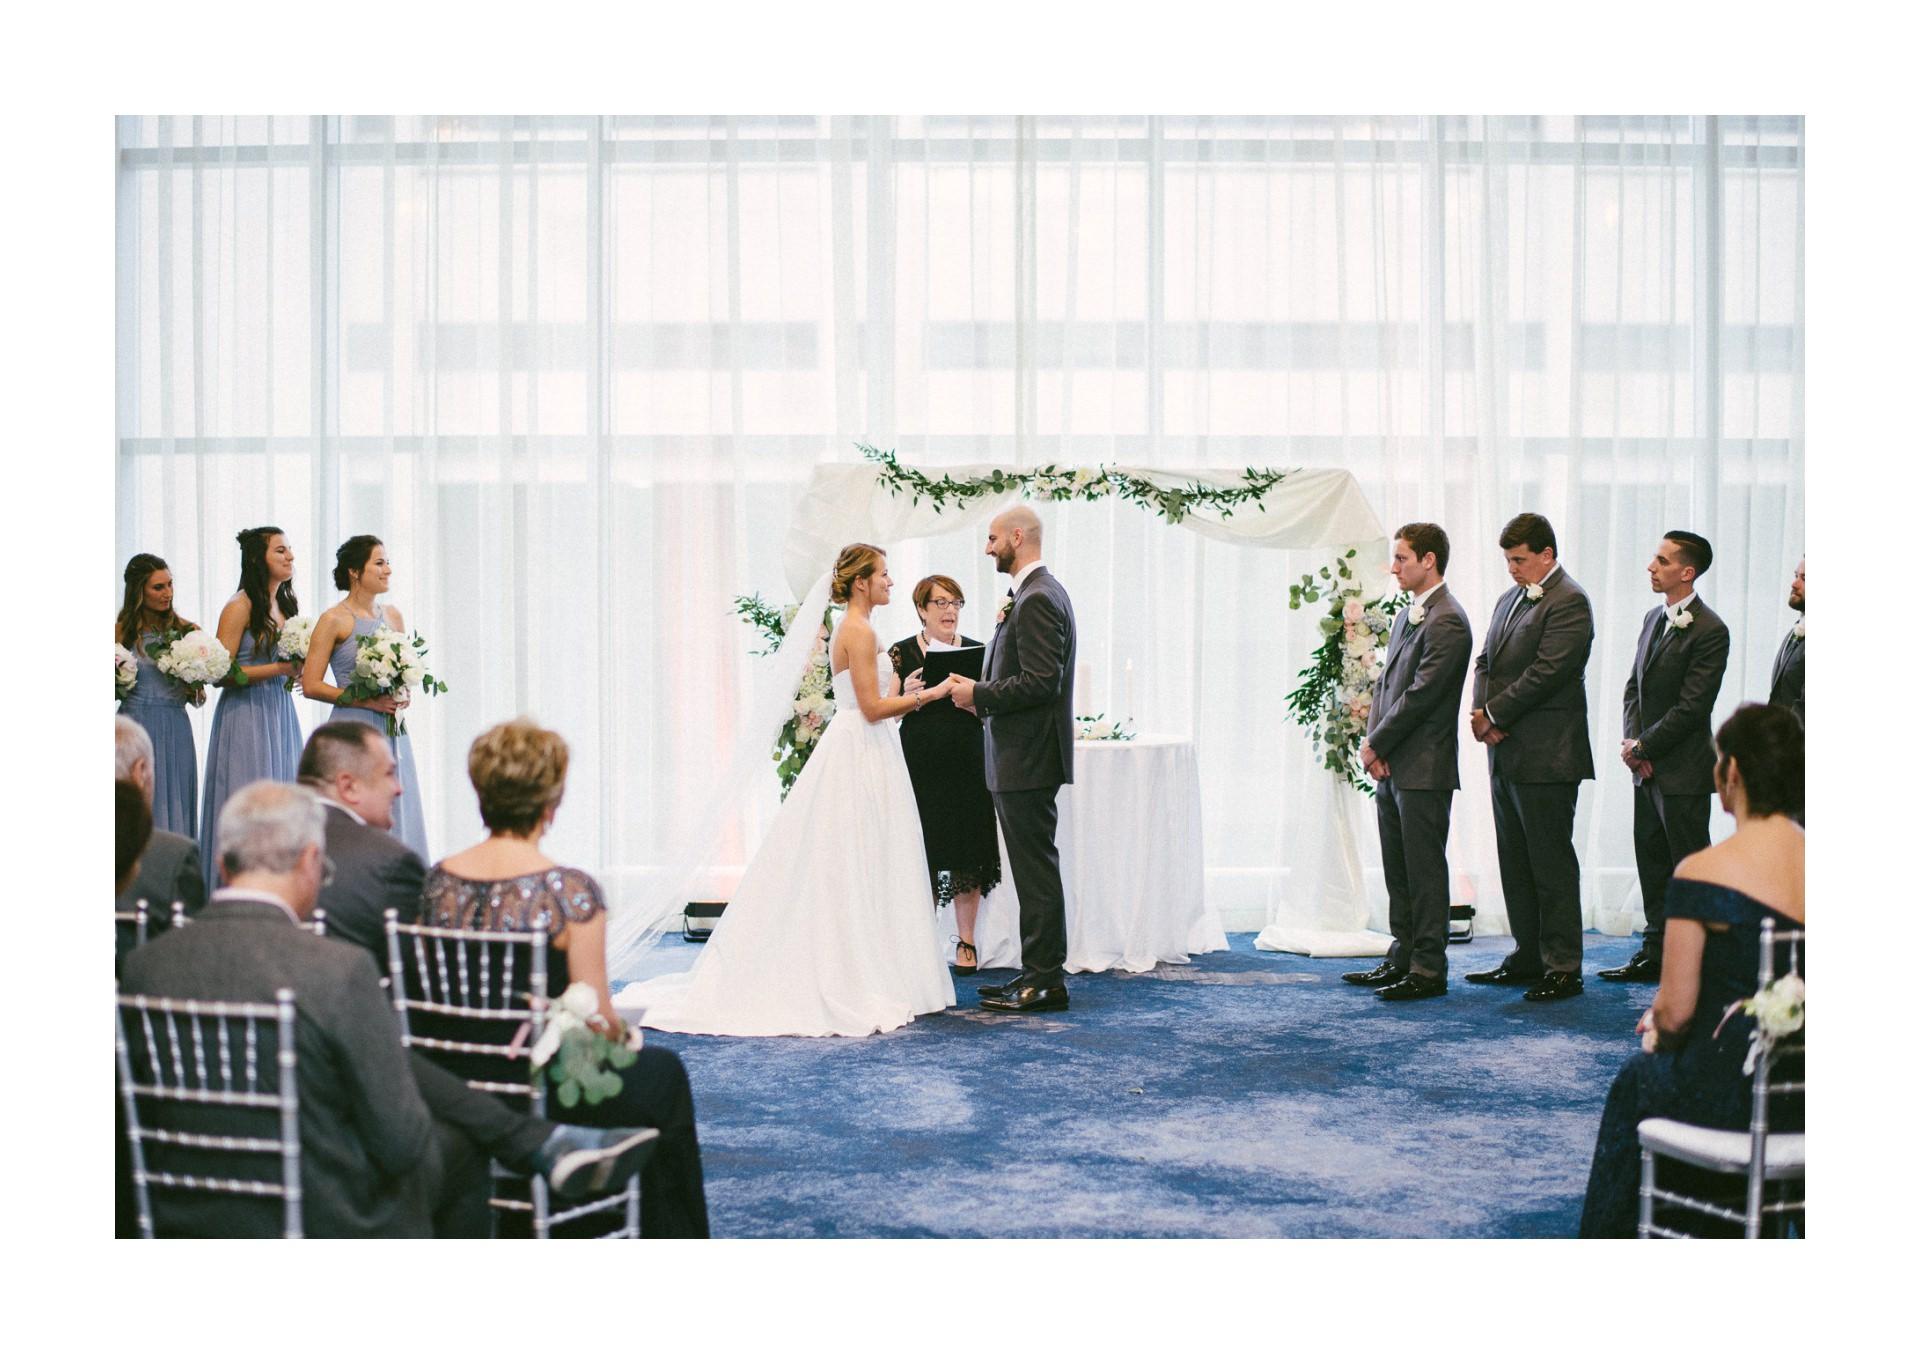 Dowtown Hilton Cleveland Wedding Photographer 2 12.jpg